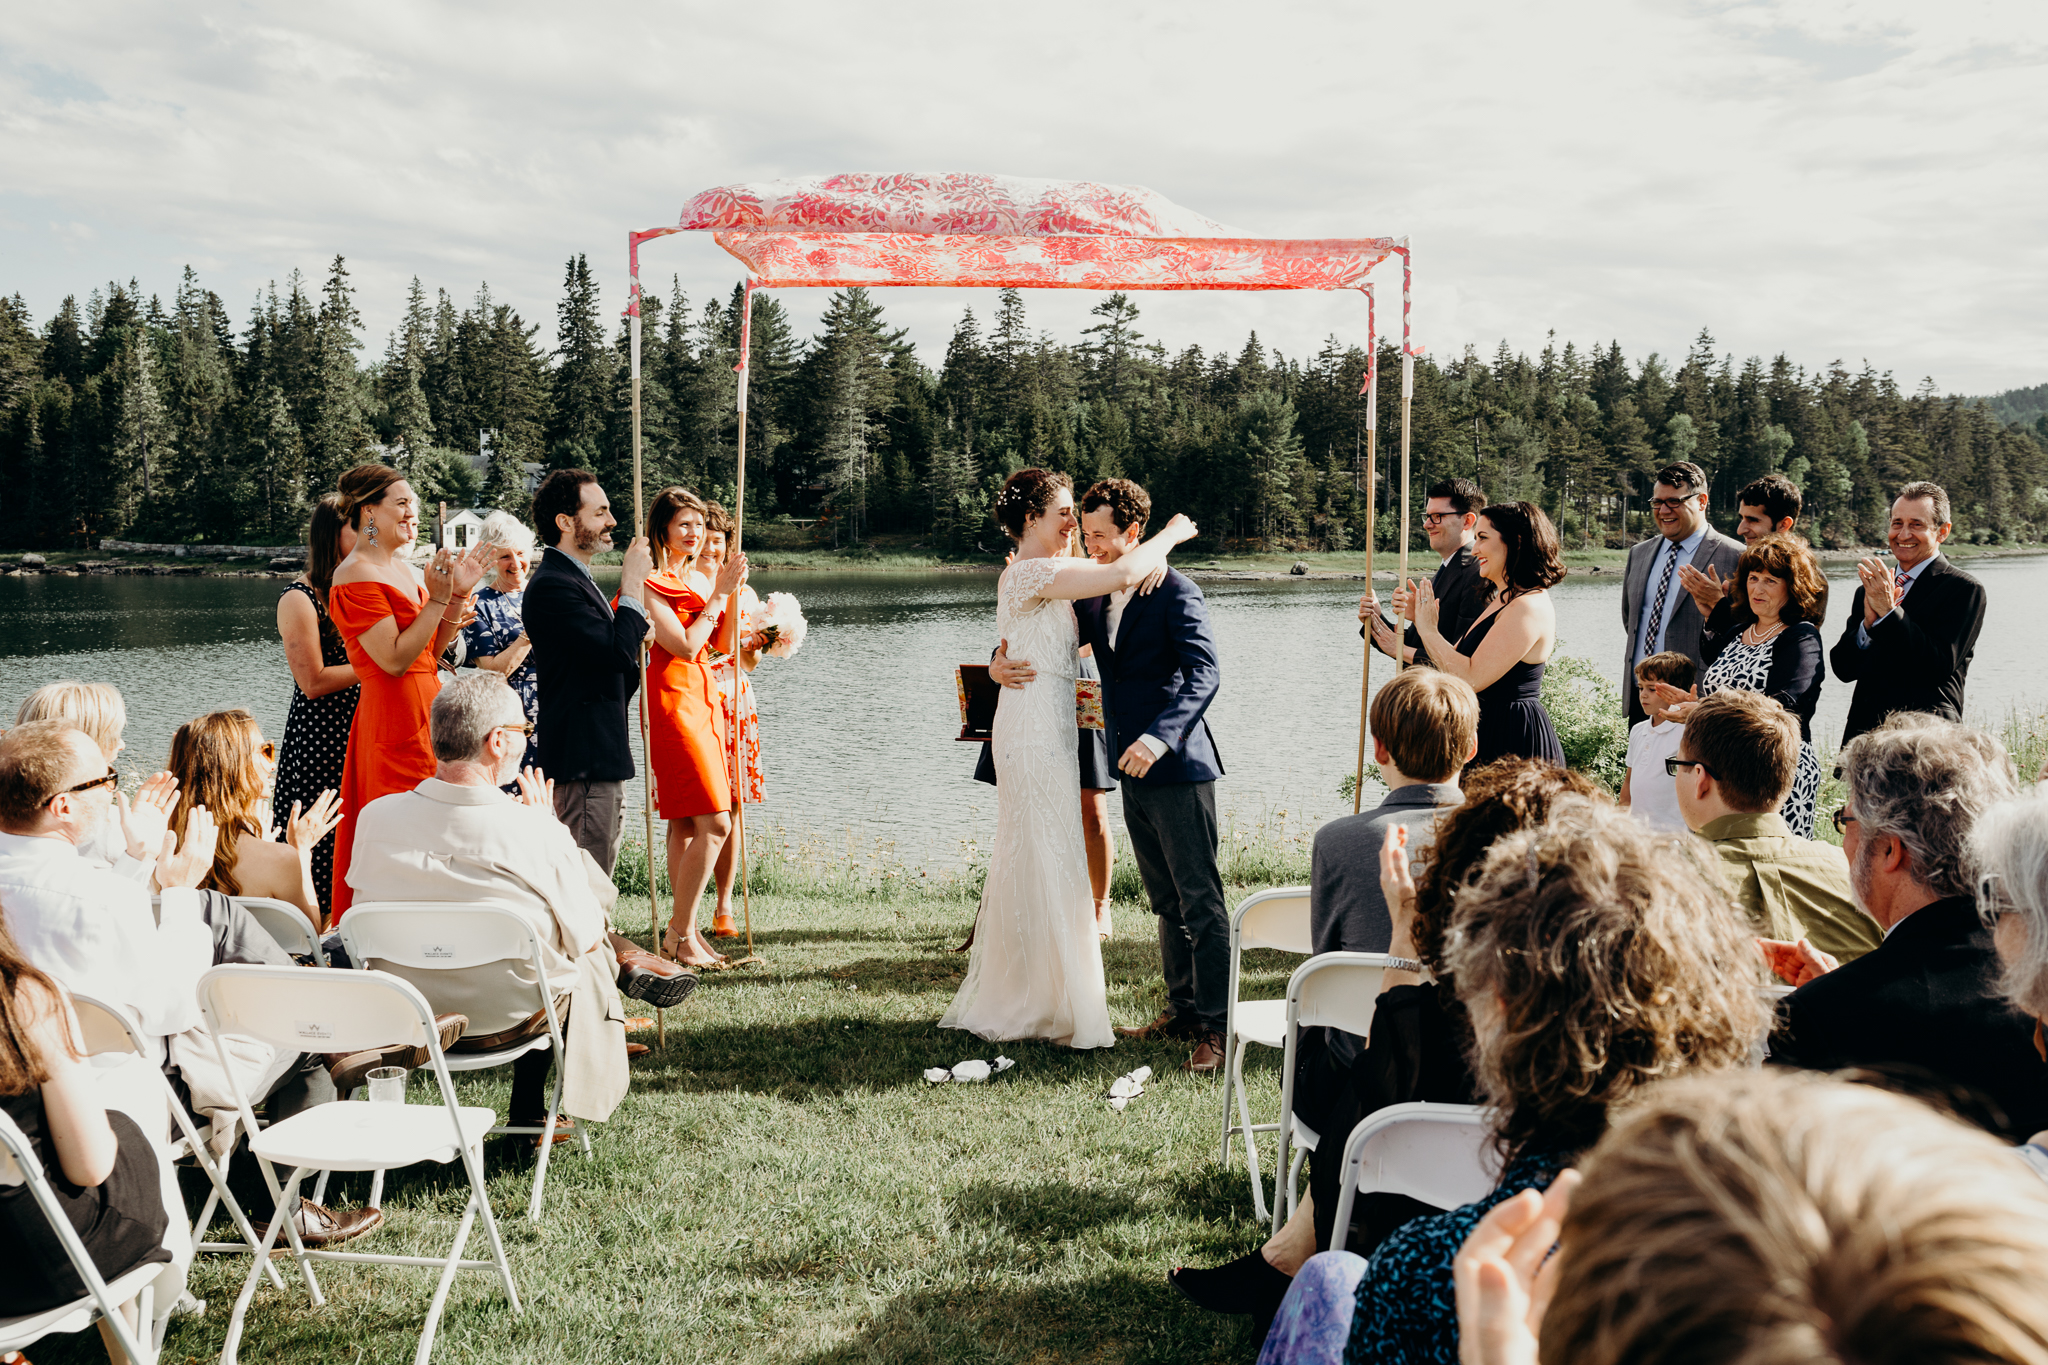 erinwheatco-1373 Maine Wedding by the Sea | Ruth & Ryan